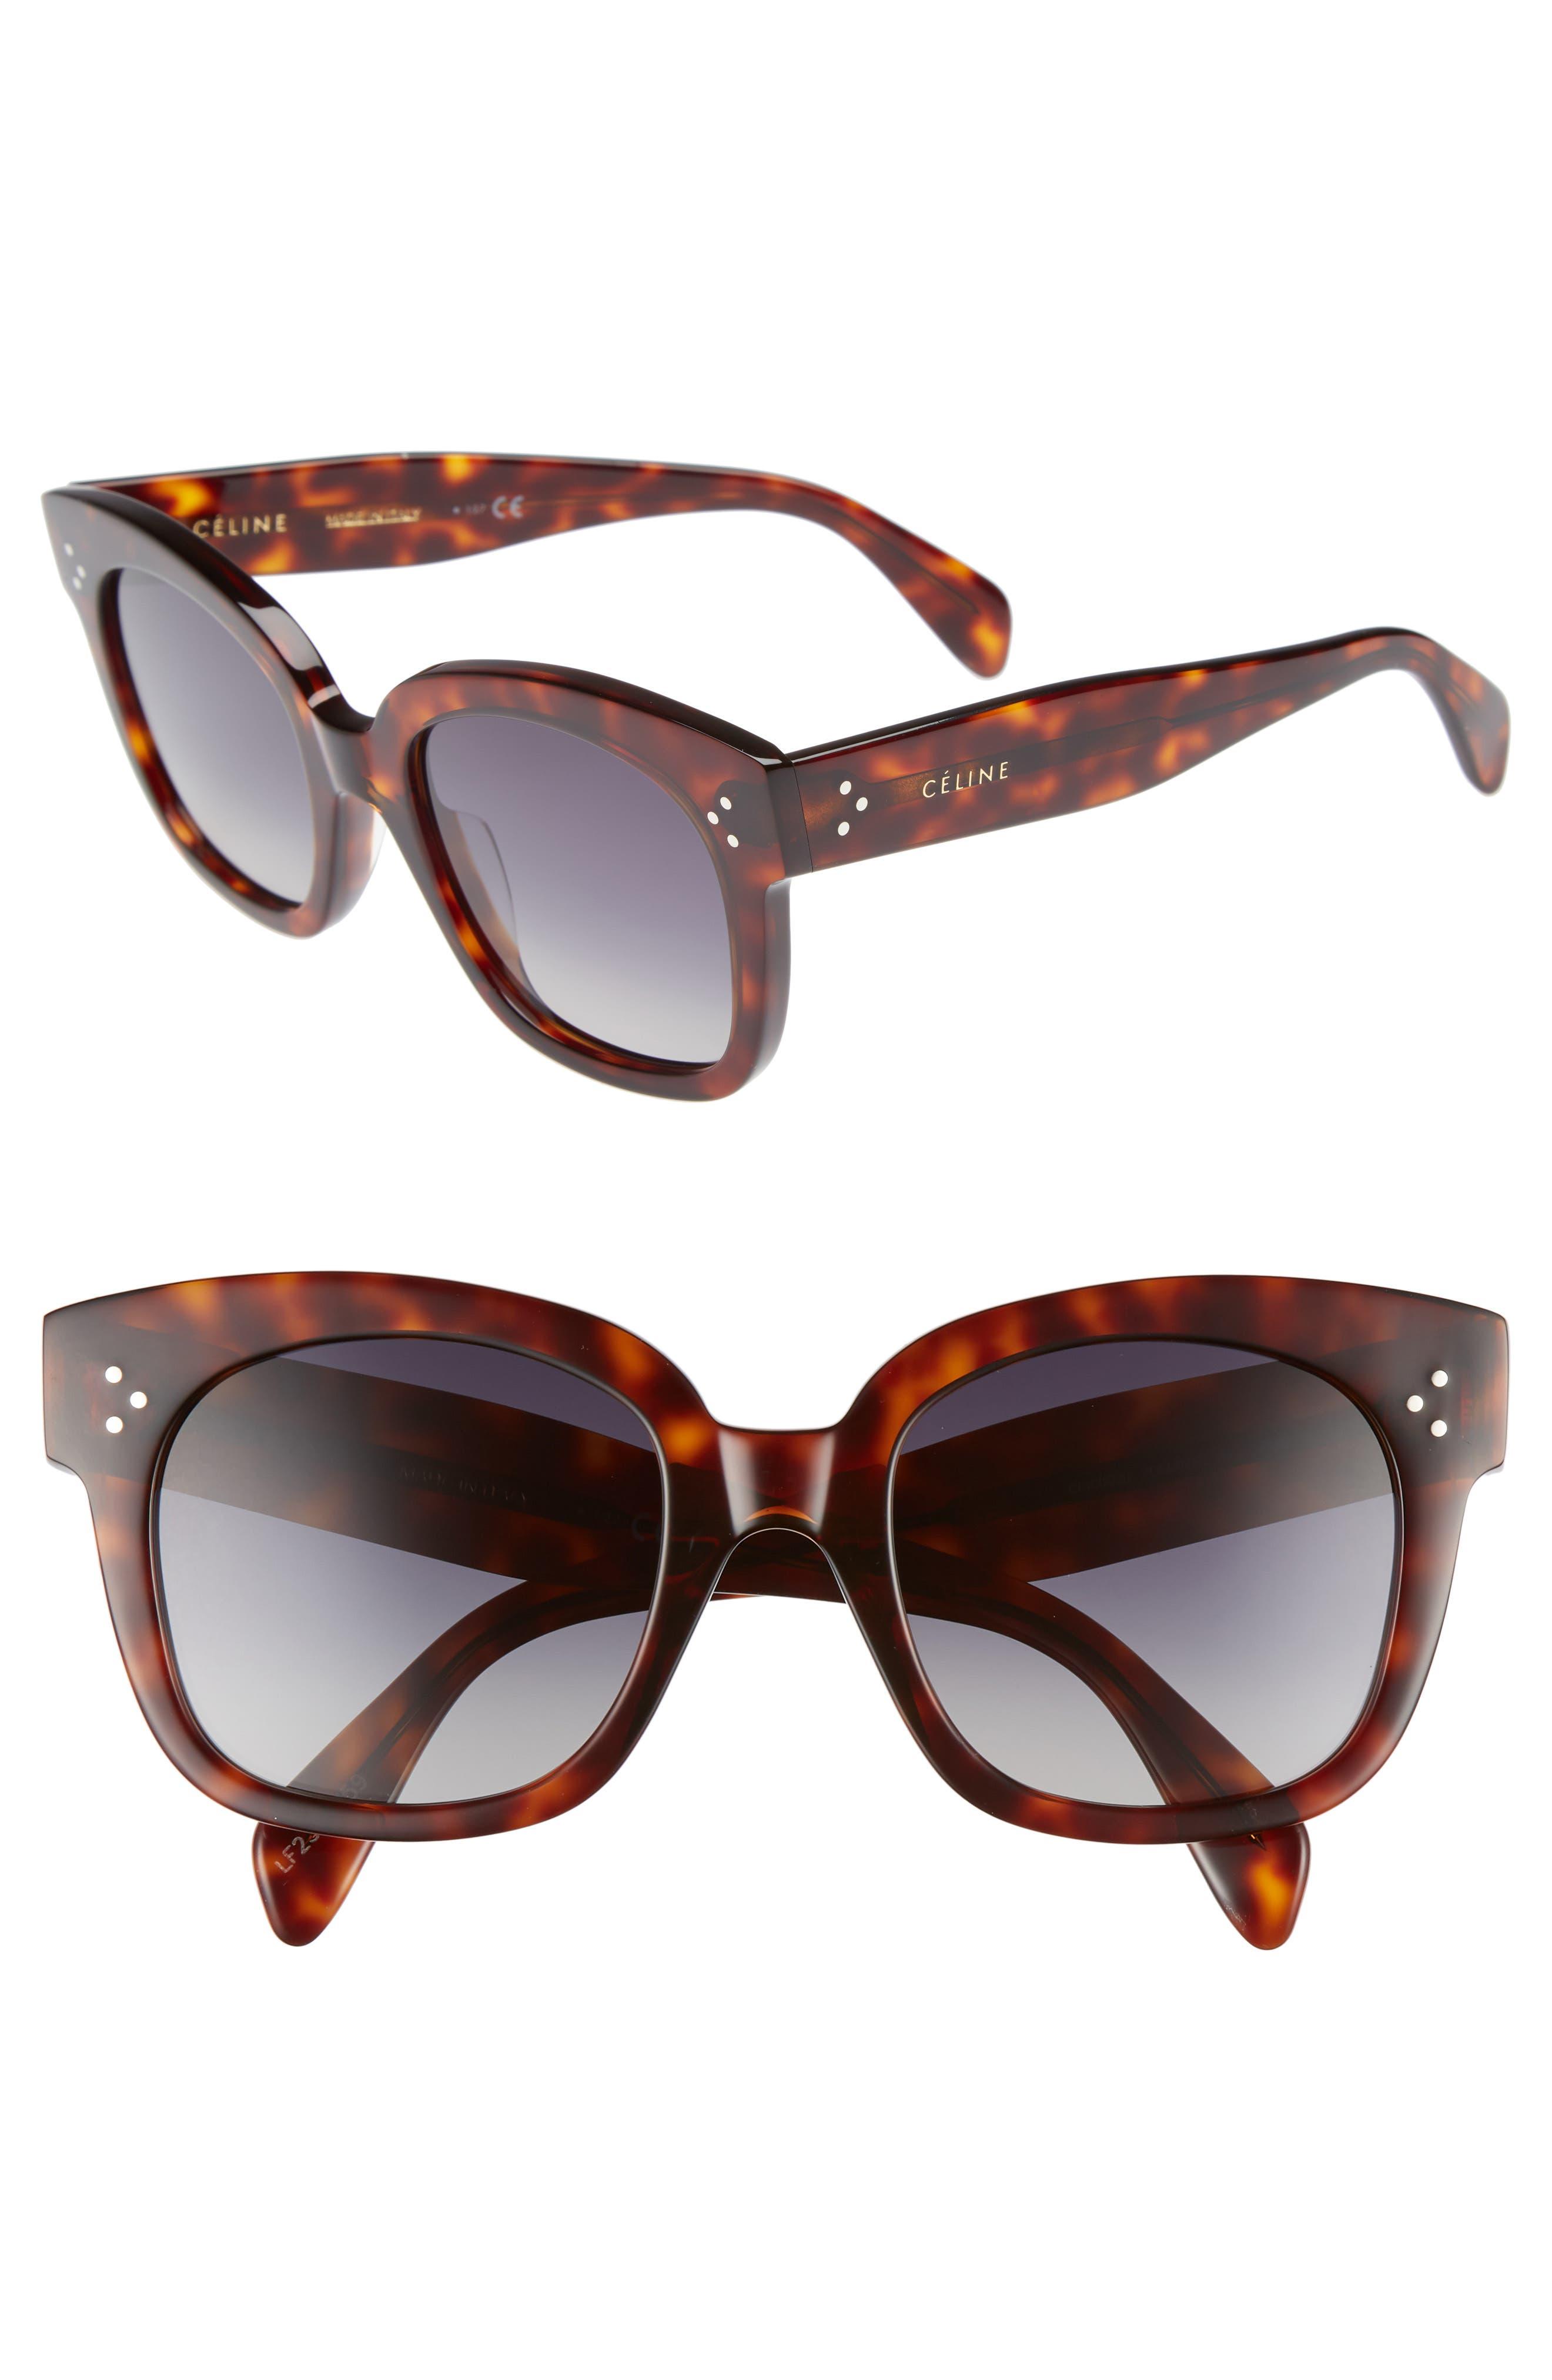 54mm Square Sunglasses,                         Main,                         color, RED HAVAN/ SMOKE